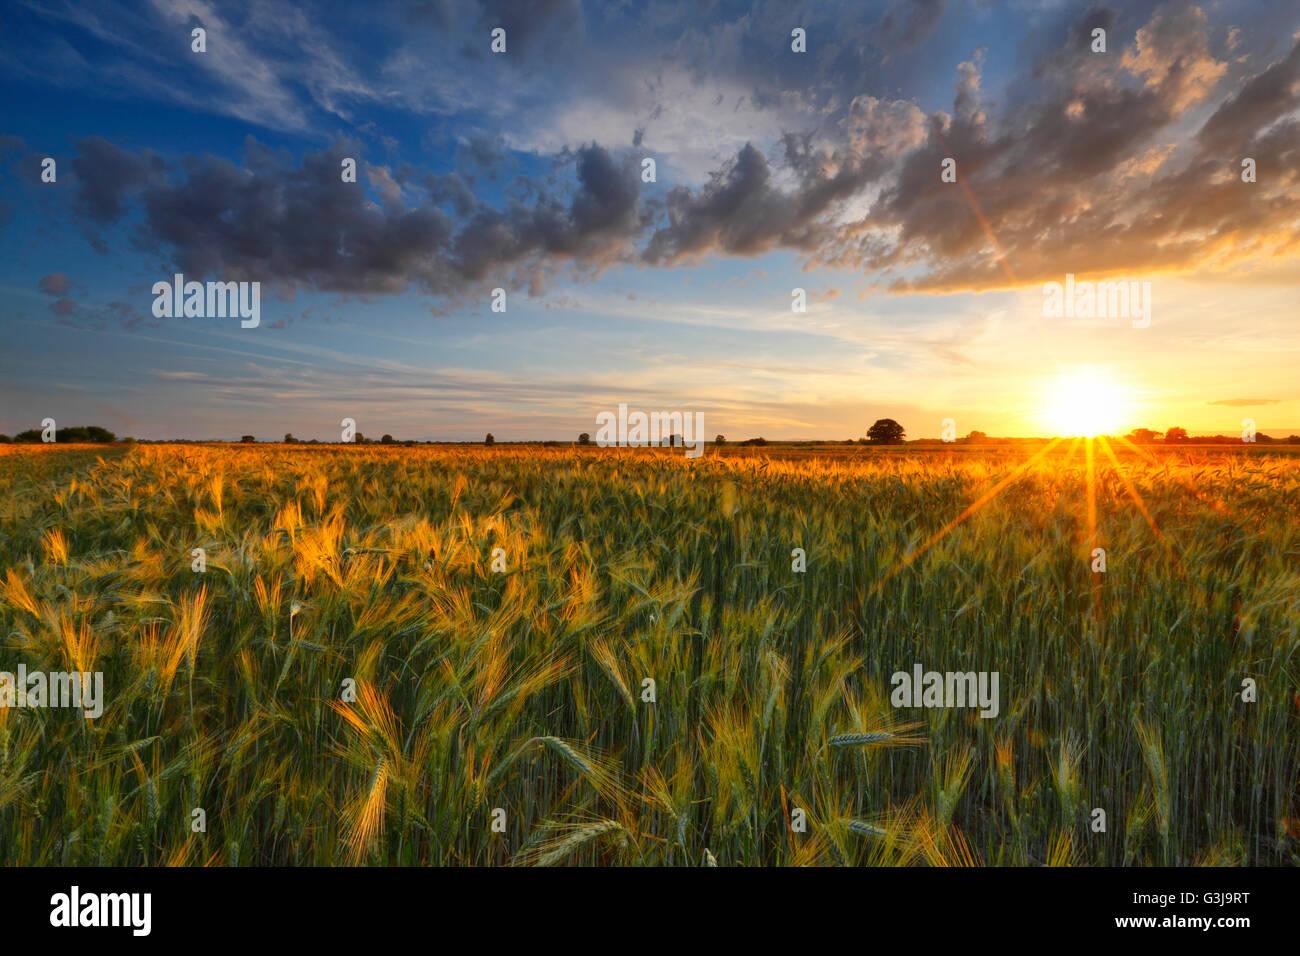 Weizenfeld bei Sonnenuntergang und Wolken Stockbild